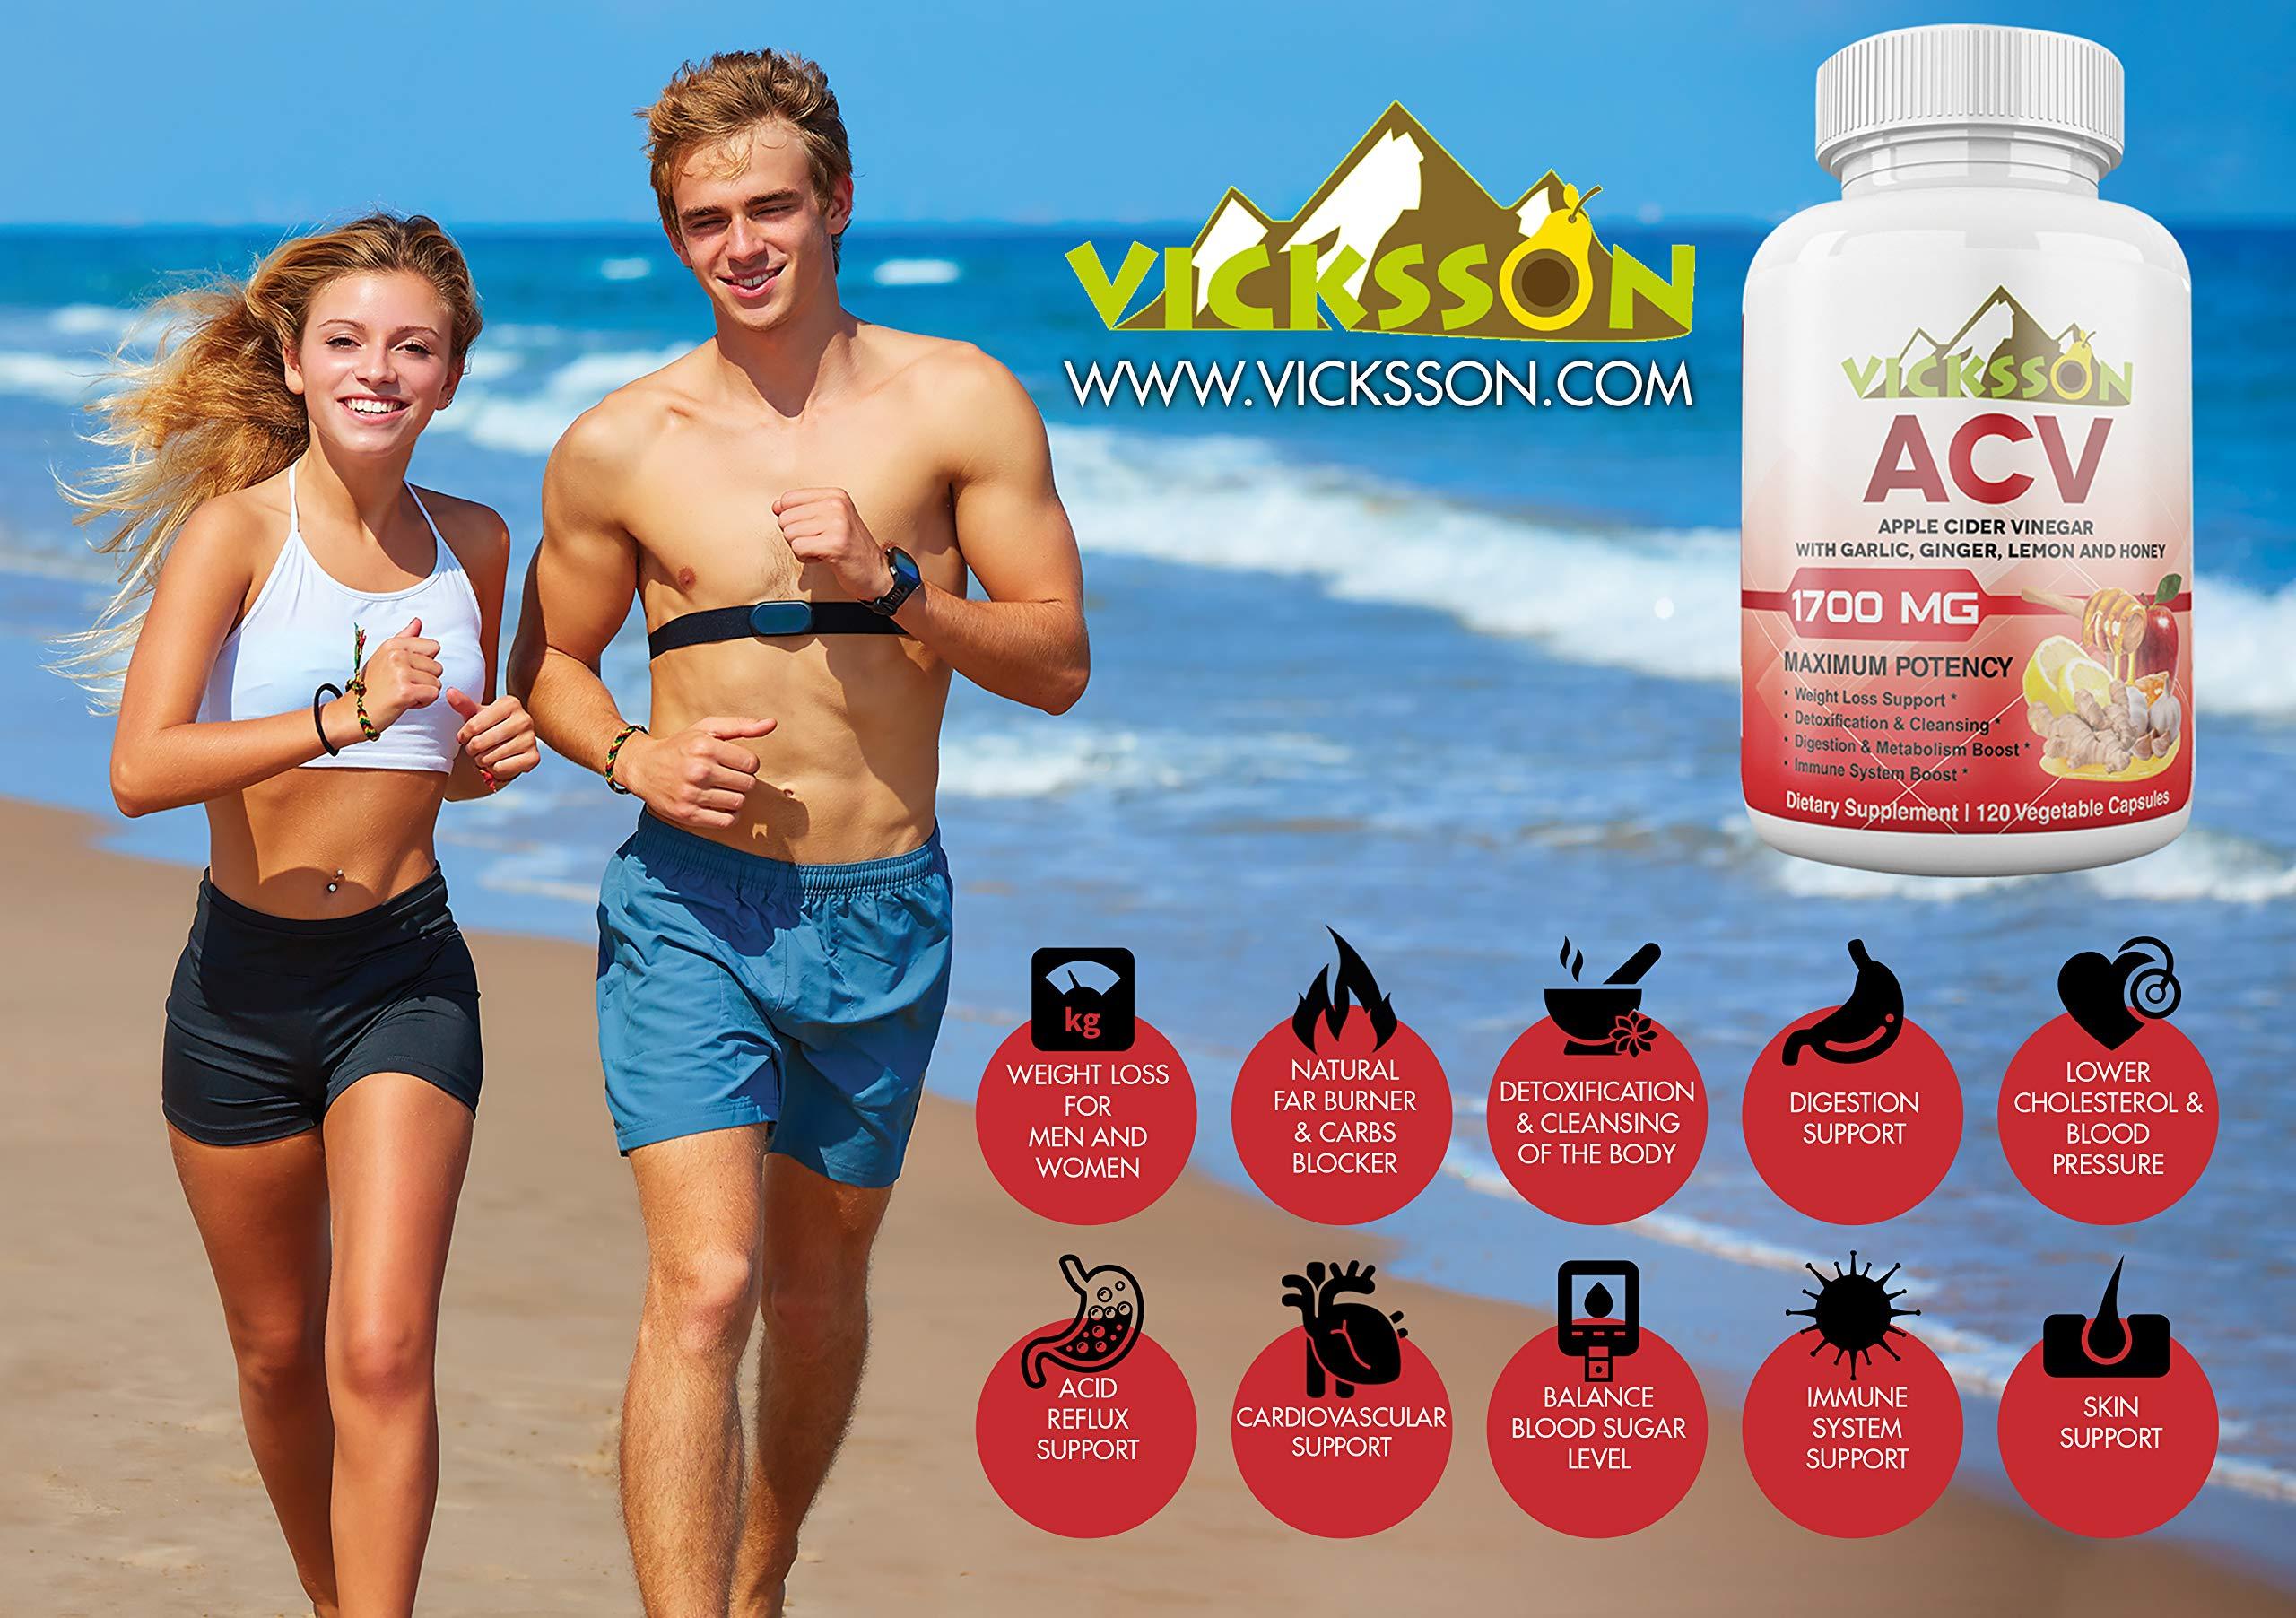 Vicksson Apple Cider Vinegar Pills 1700 mg of ACV with Garlic, Ginger, Lemon & Honey for Weight Loss, Detox, Cleanse, Appetite Suppressant, Metabolism & Immune Booster, Bloating Relief | 120 Capsules